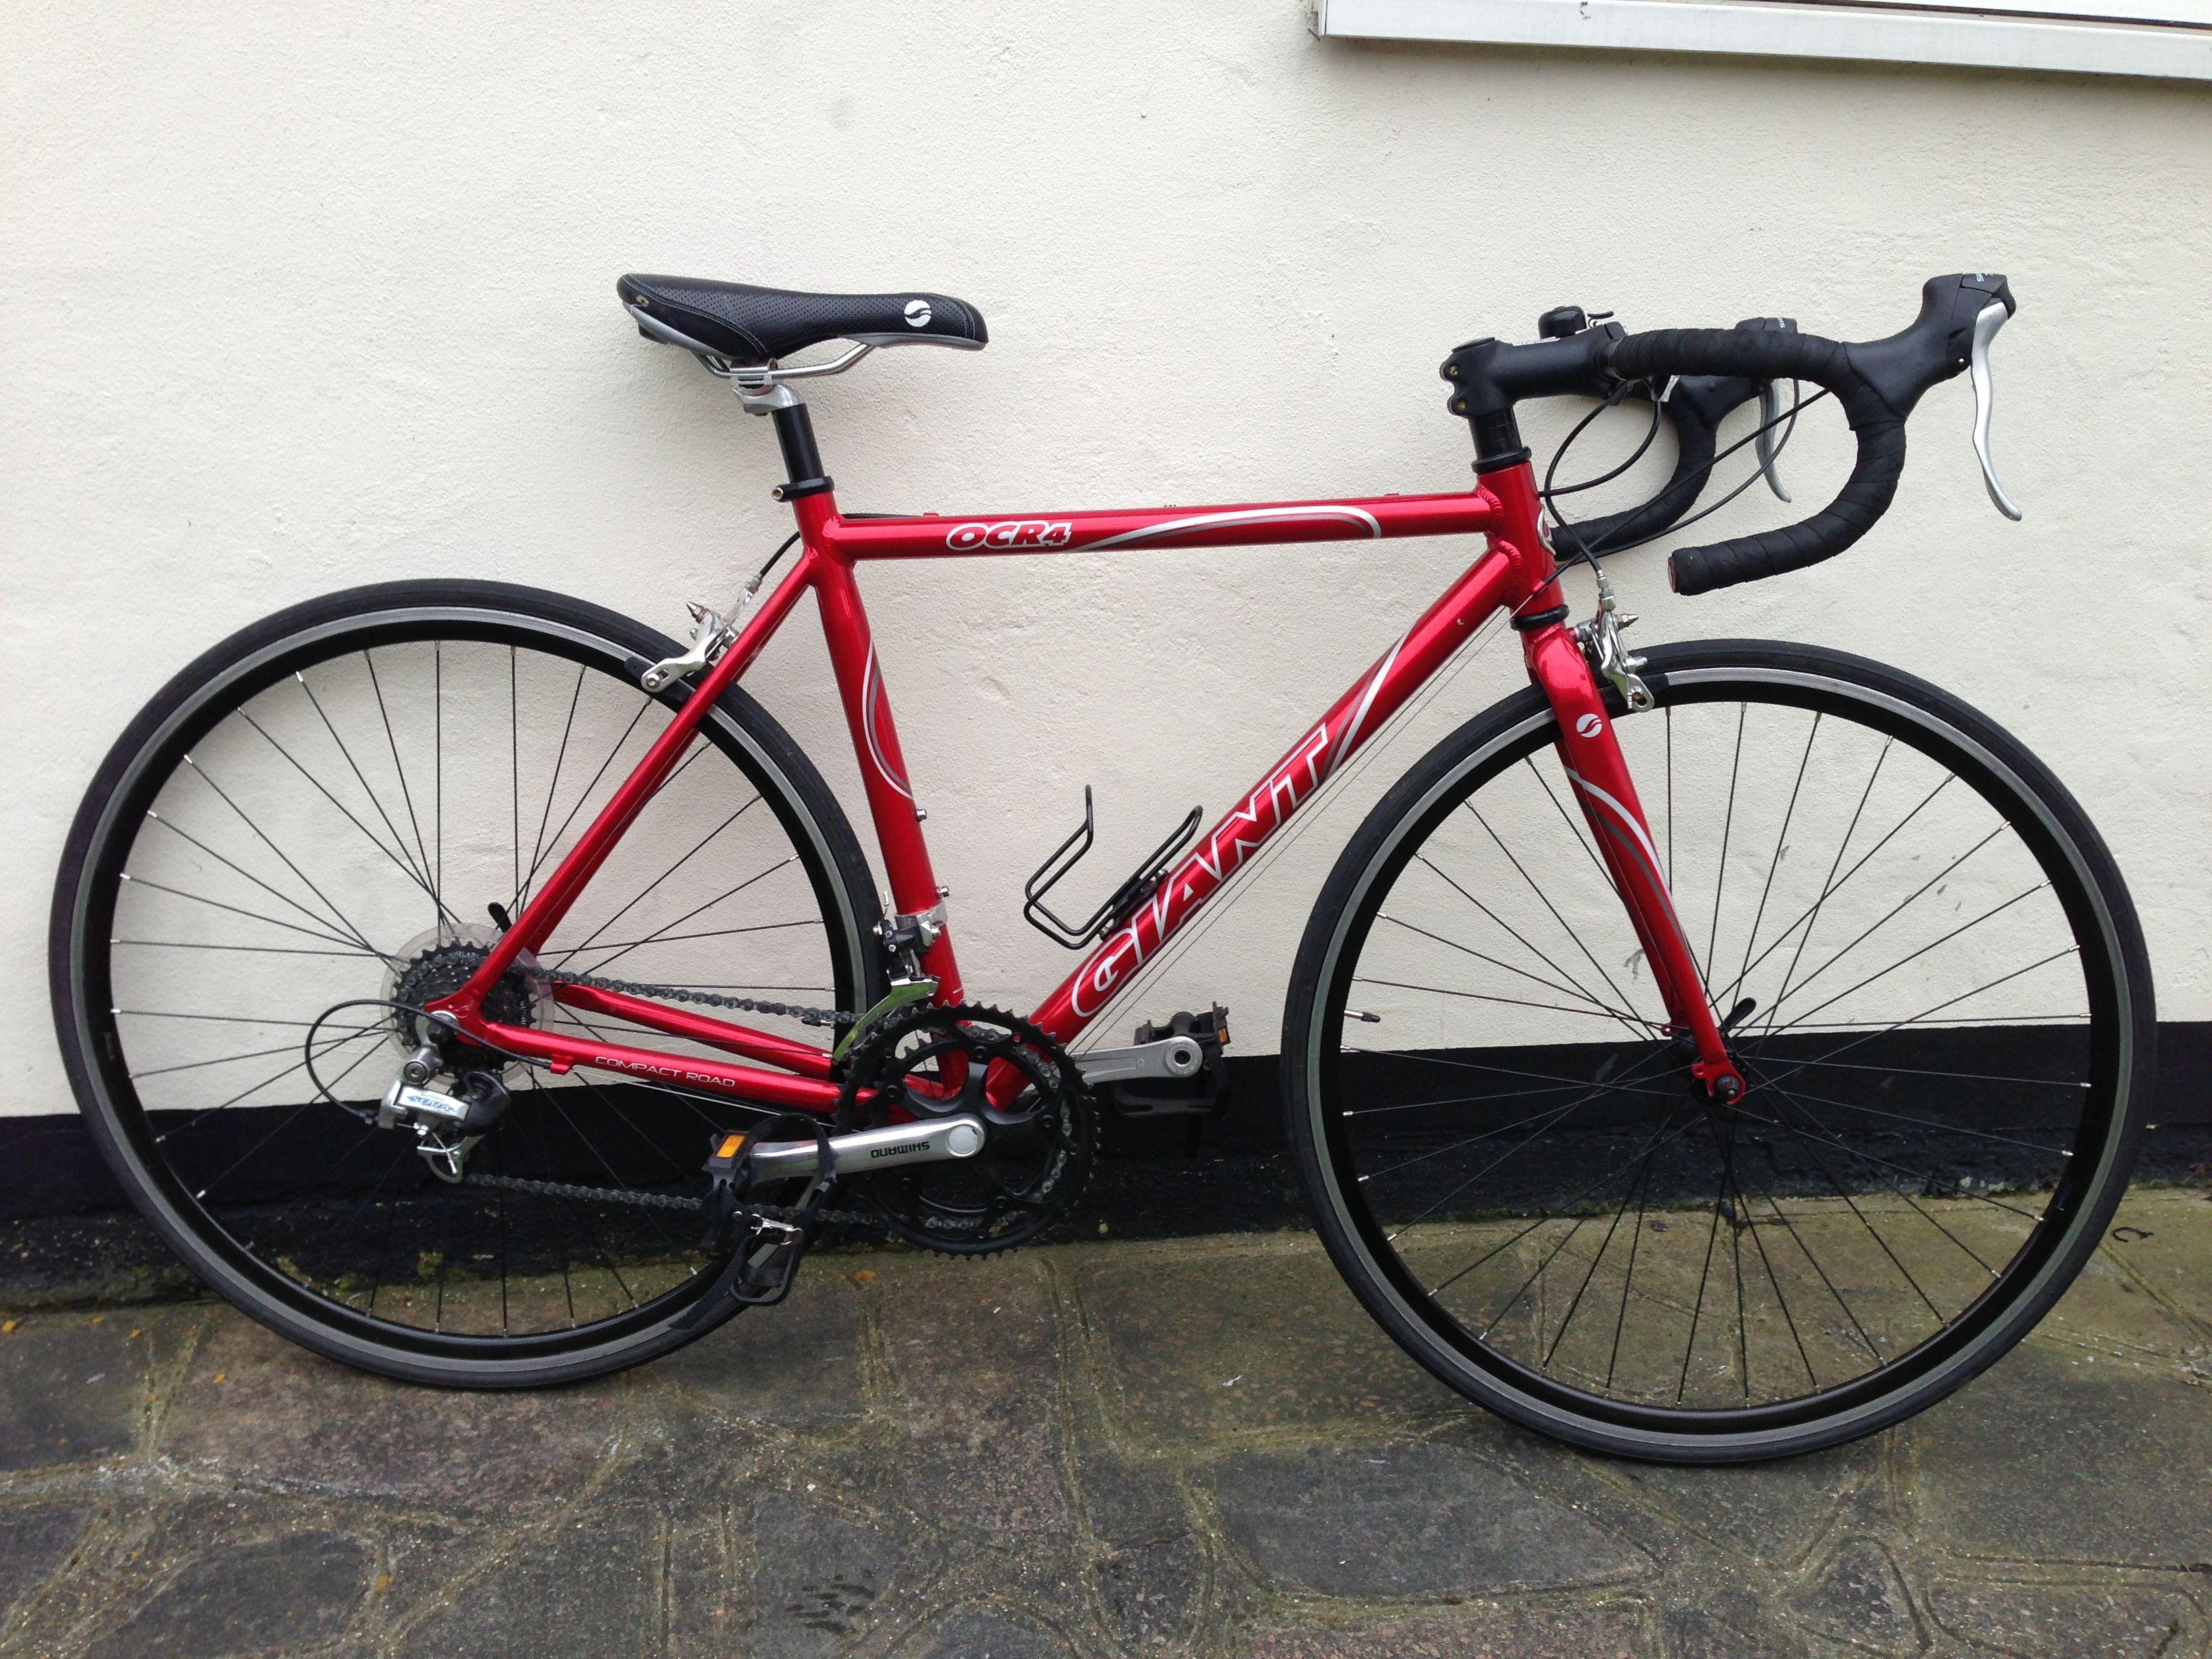 36efd5091cd giant ocr 4 (2006) - dean's bike | bike | Bike, Bicycle, Water bottle